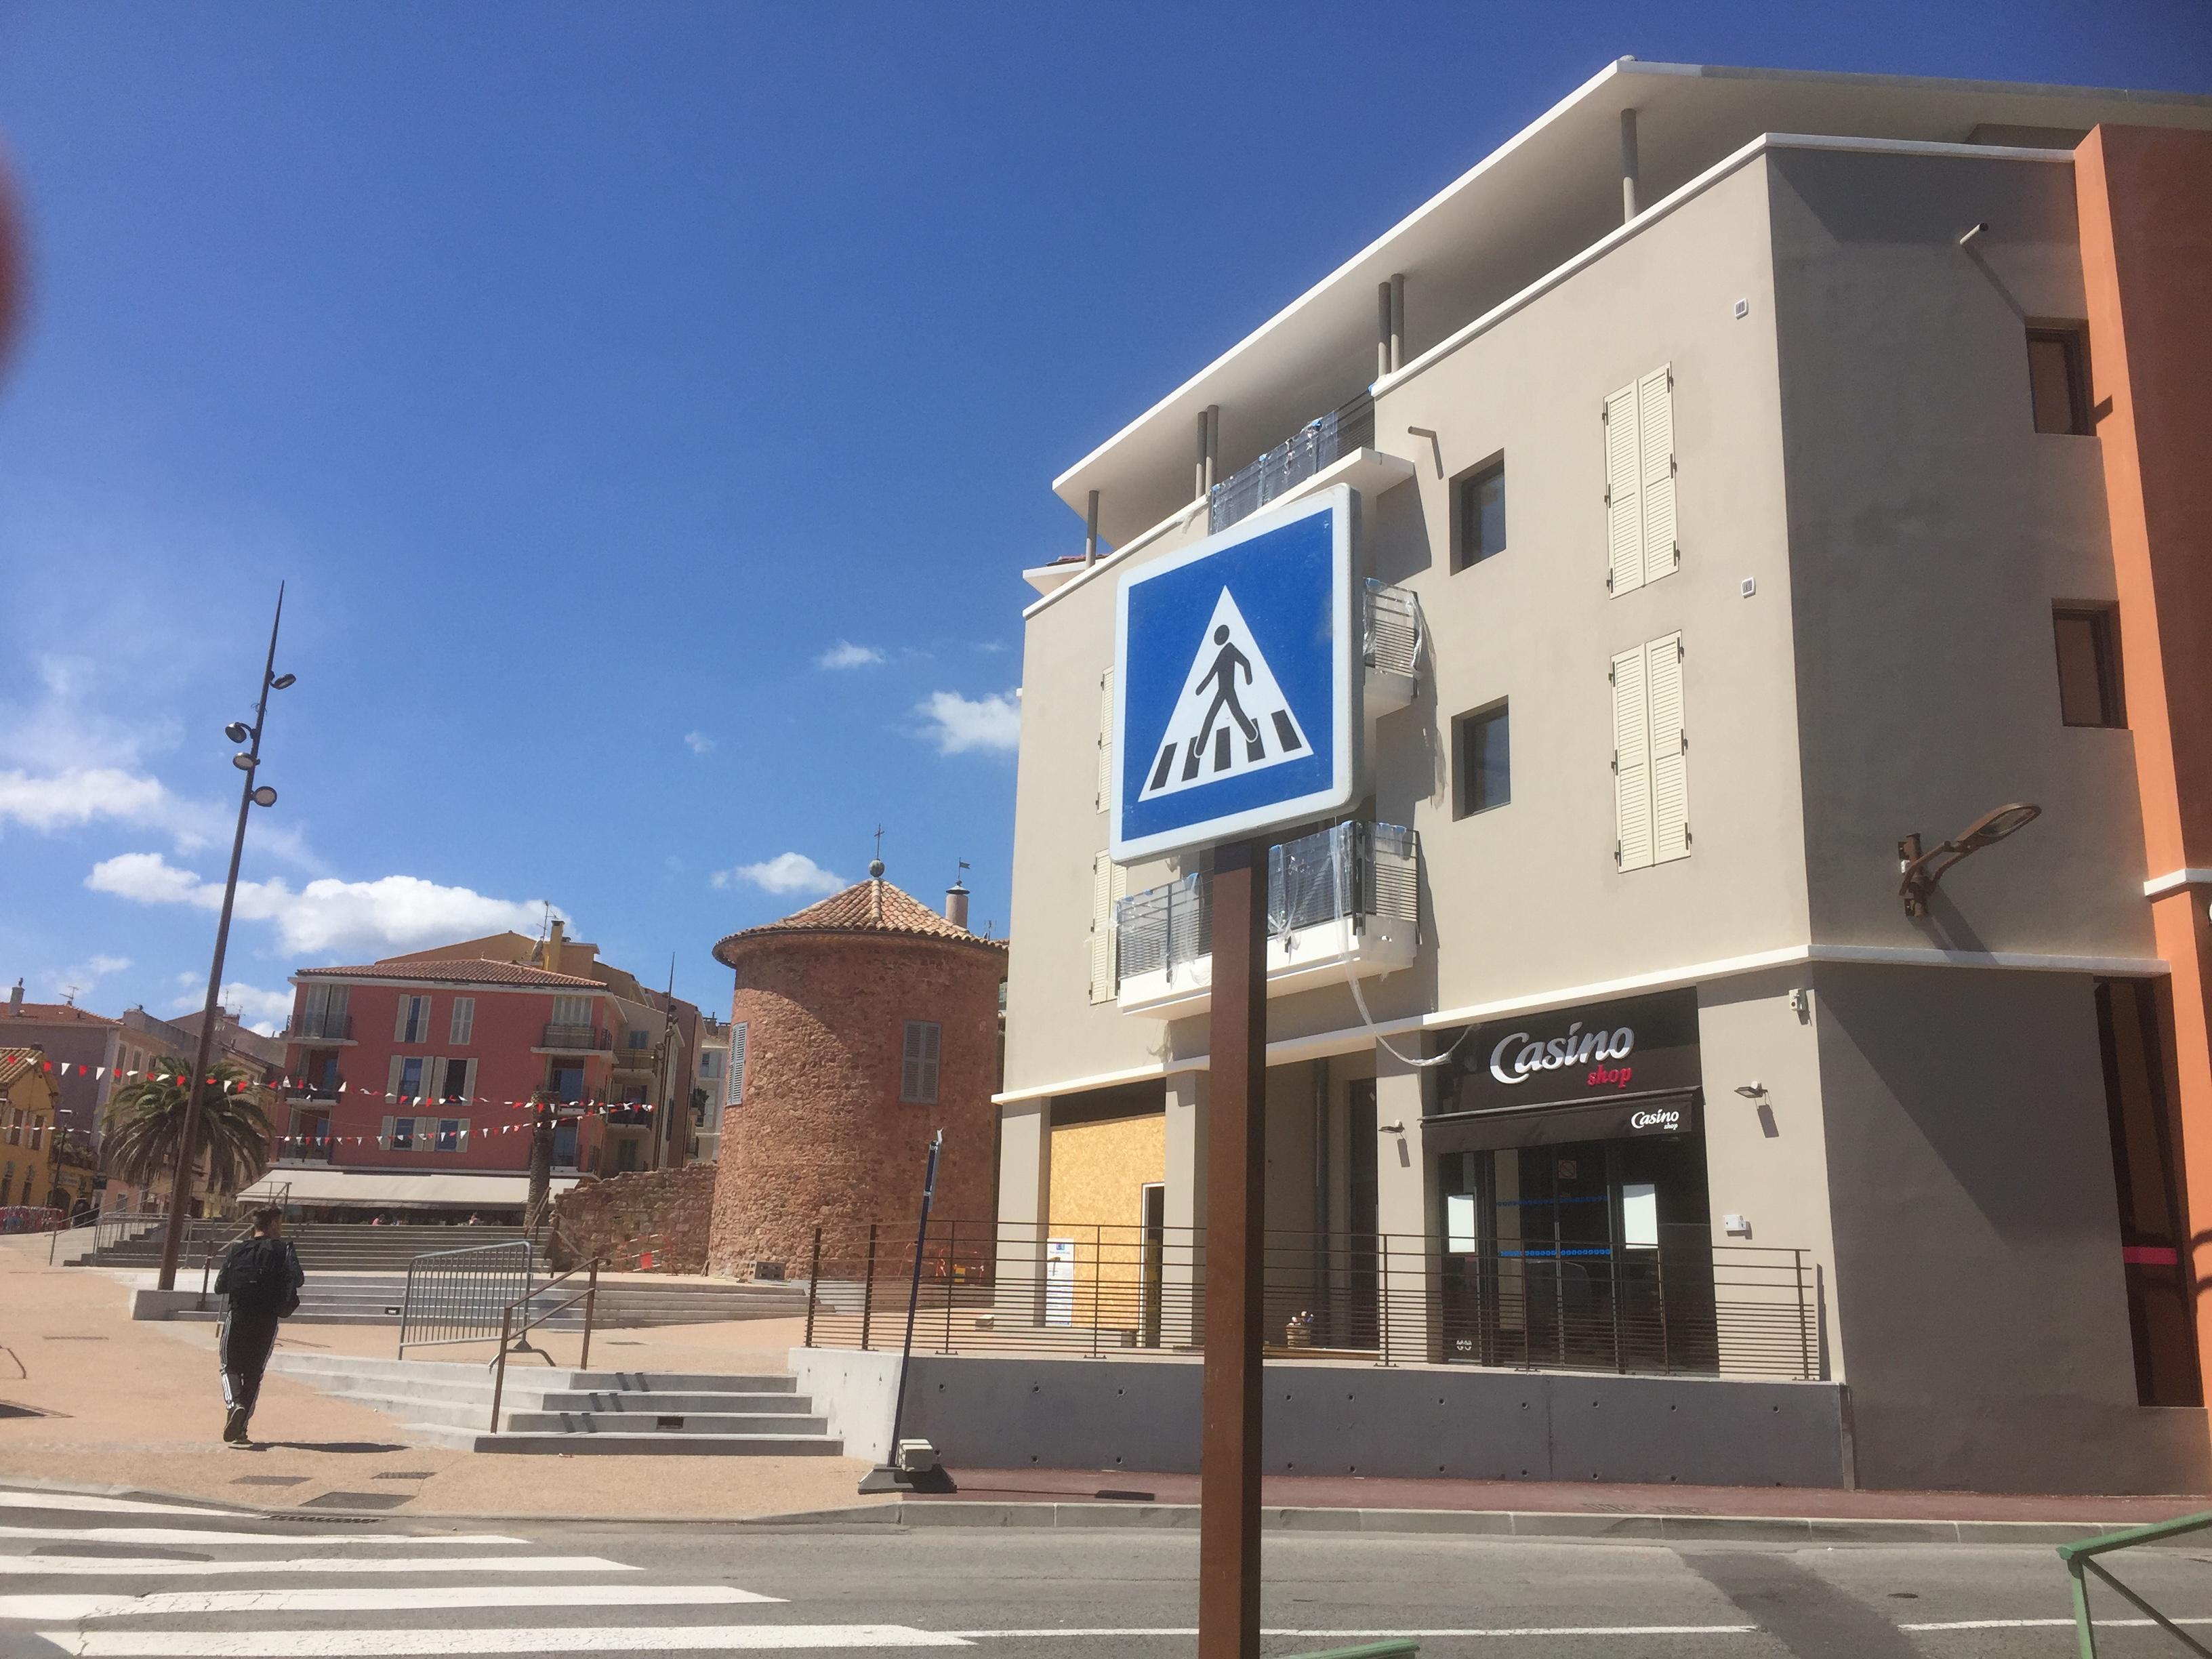 Achat-Vente-Loft-Paca-VAR-Frejus